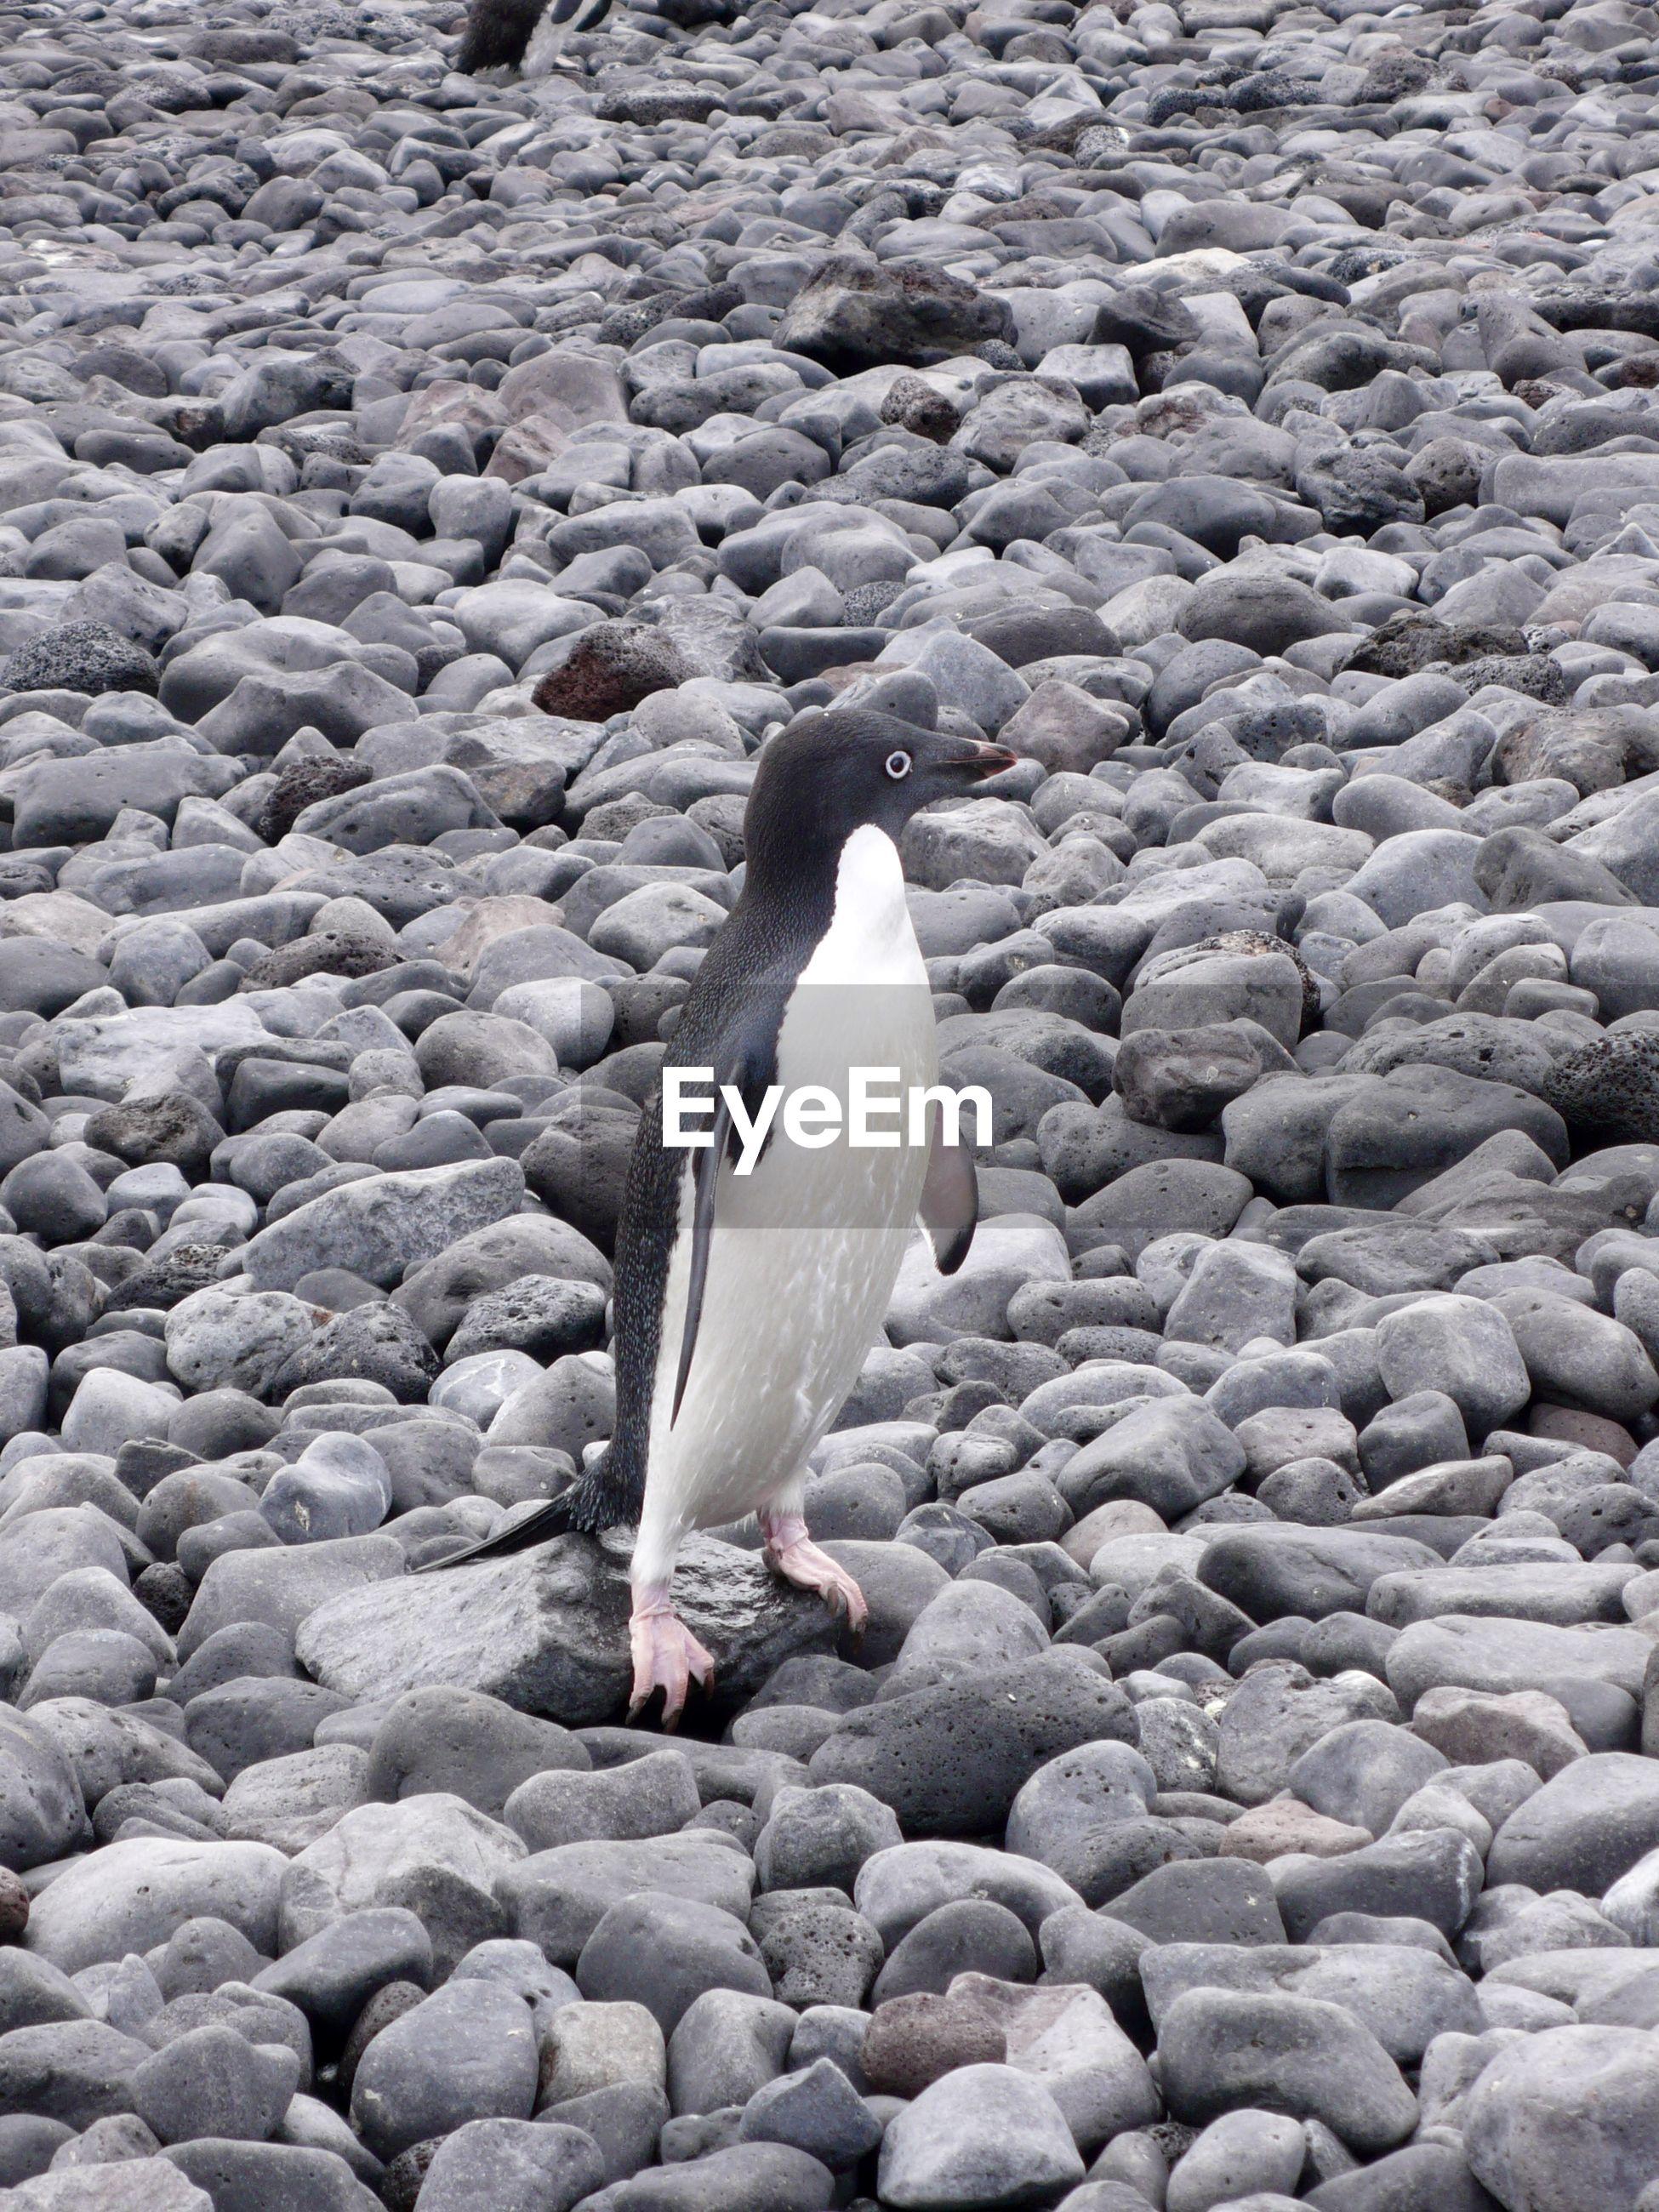 Penguin standing on pebbles